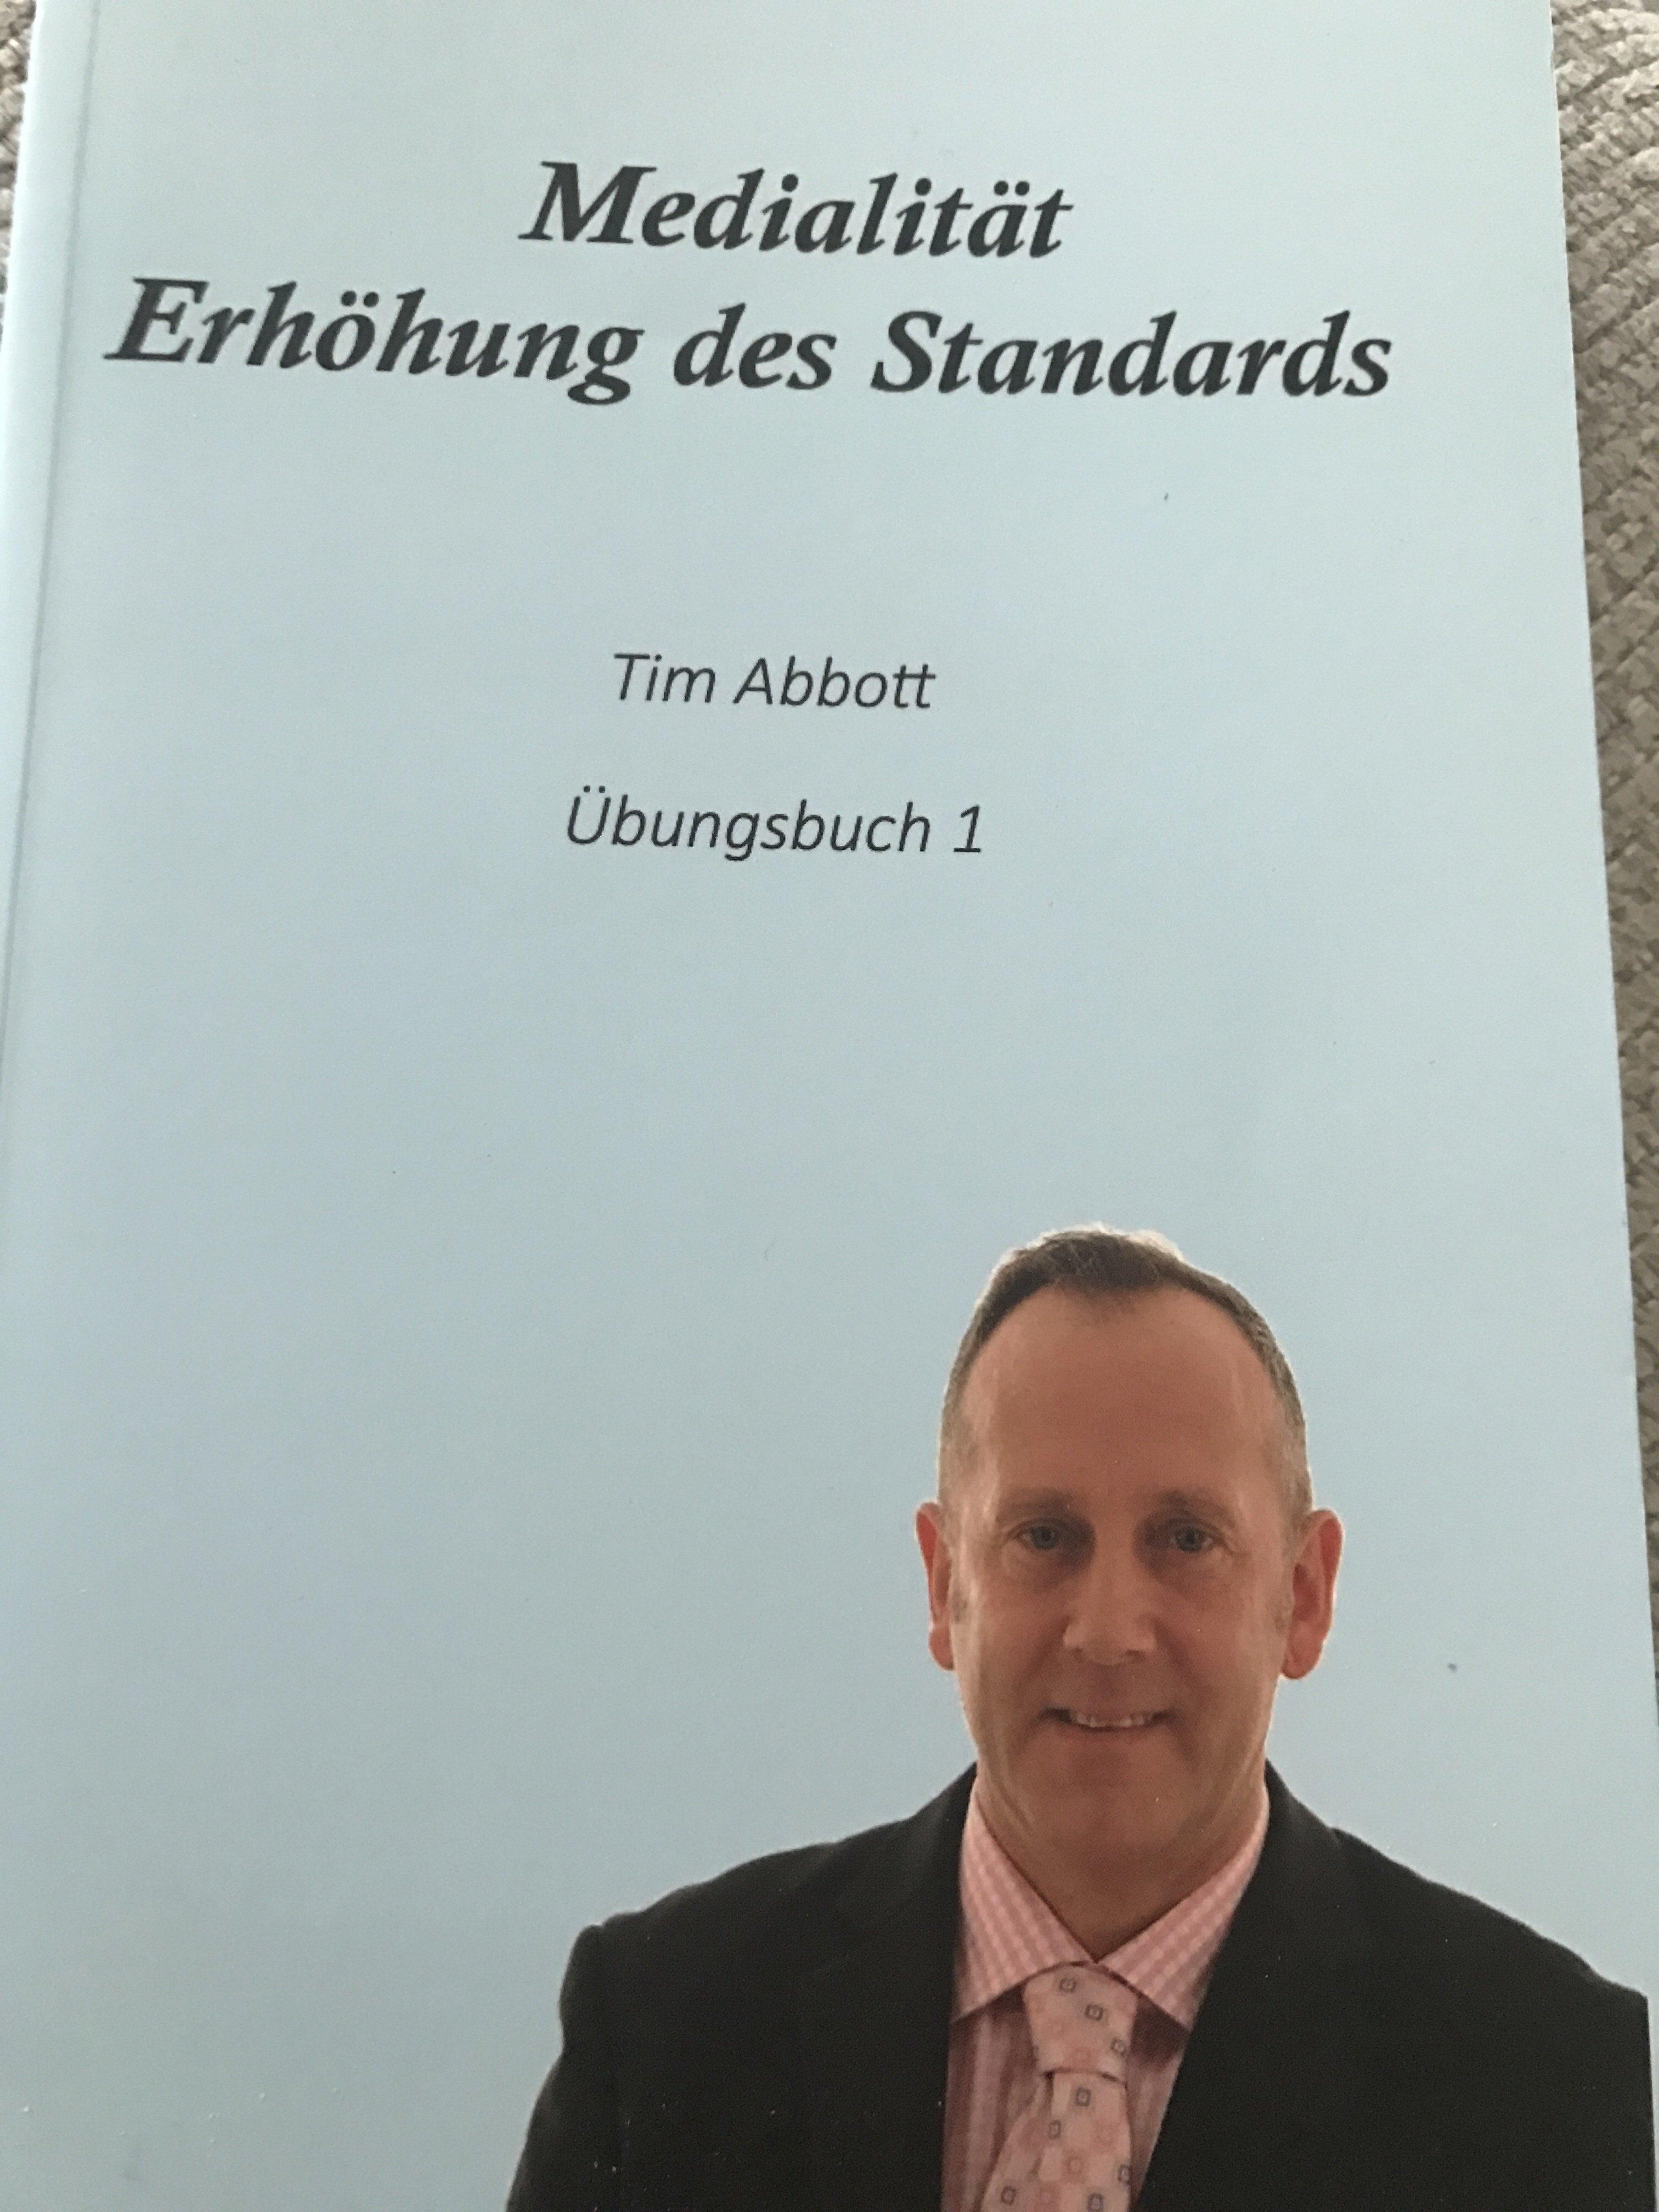 GERMAN-VERSION-BOOK-1 EMAILED VERSION-Medialitat-Erhohung-des-standards-Ubungsbuch-1 00005